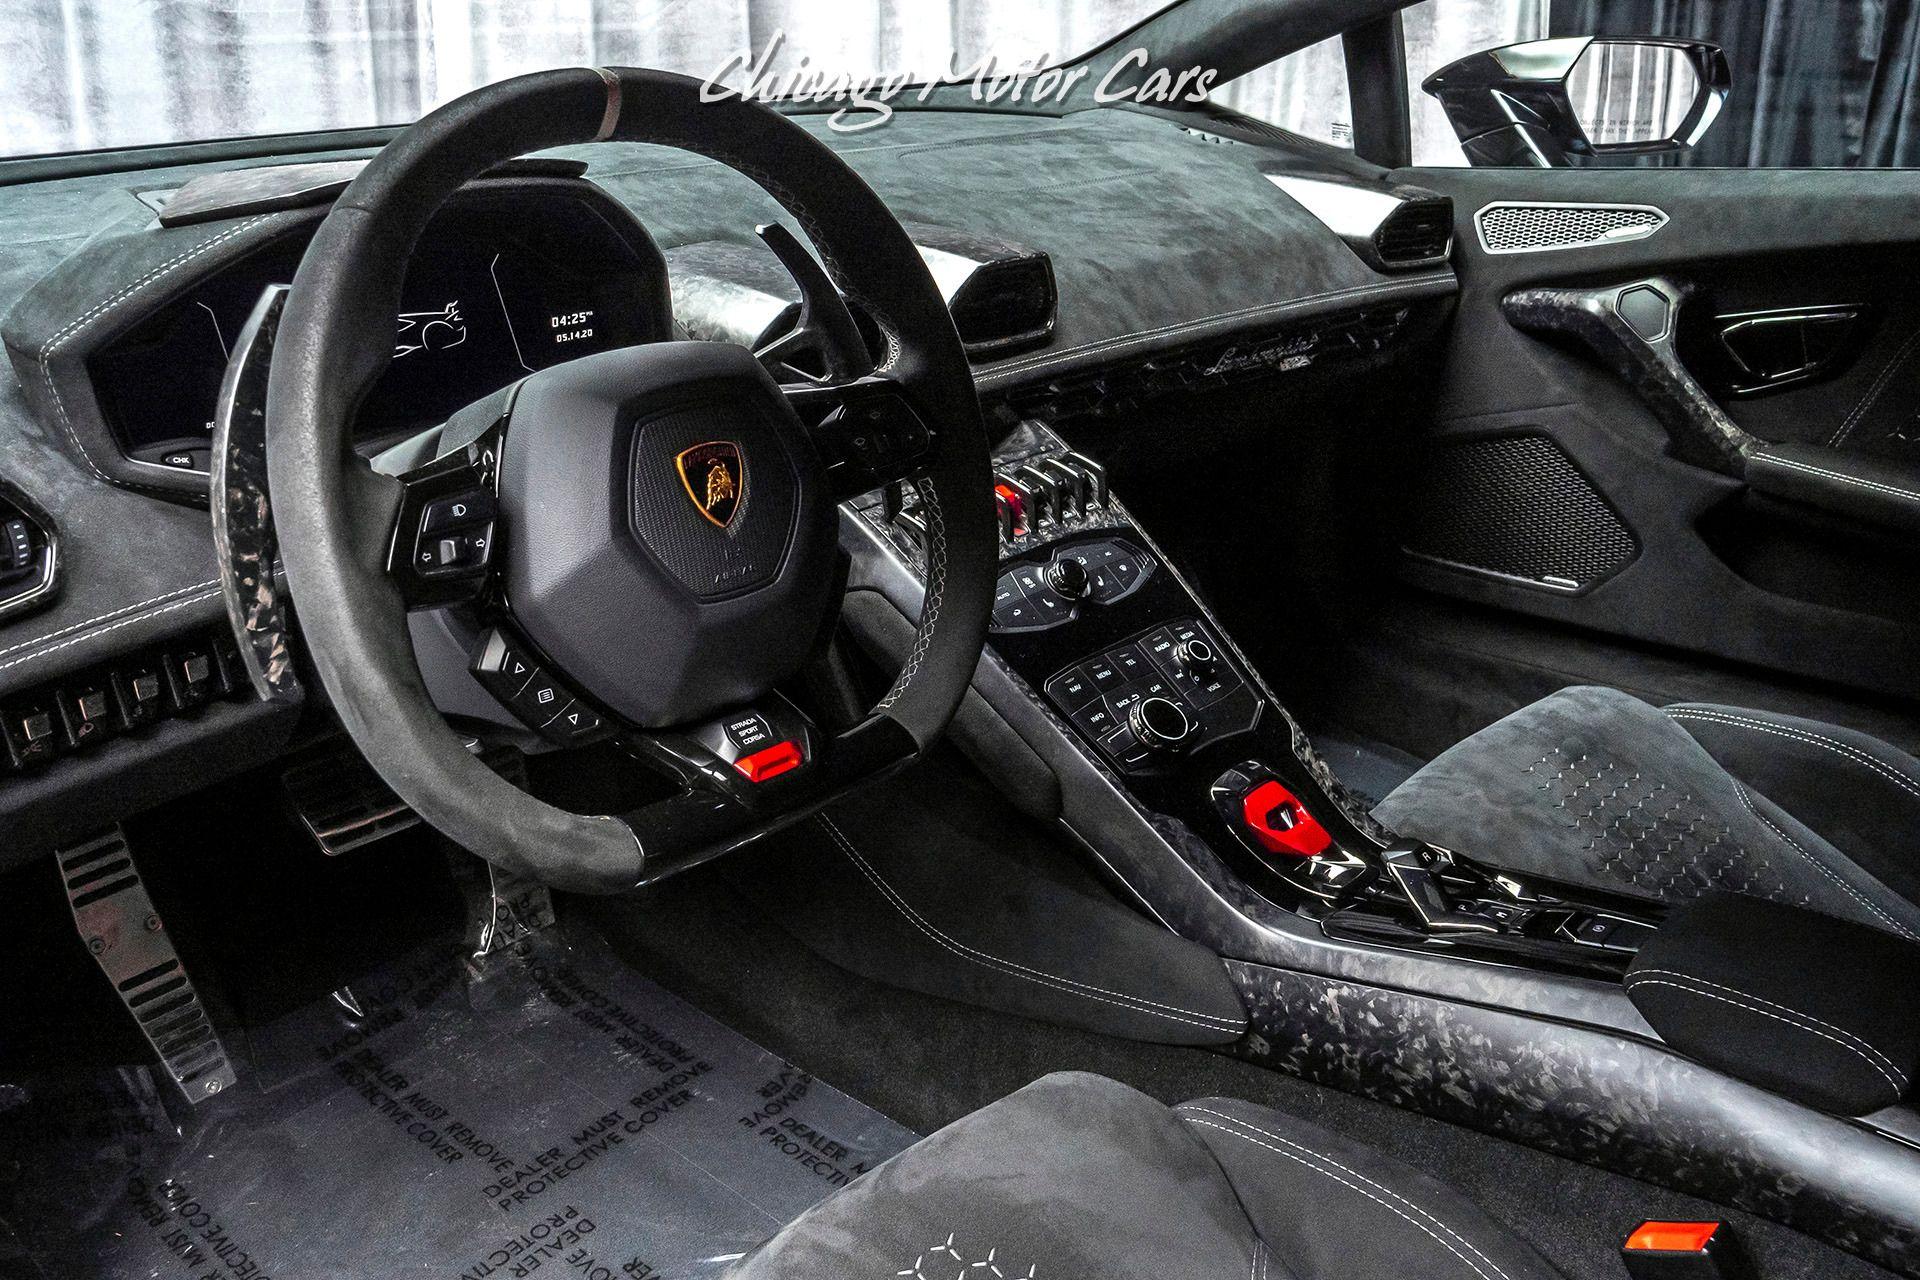 2018 Lamborghini Huracan Performante Lp640 4 Coupe Chicago Motor Cars United States For Sale Lamborghini Huracan Lamborghini Huracan Interior Lamborghini